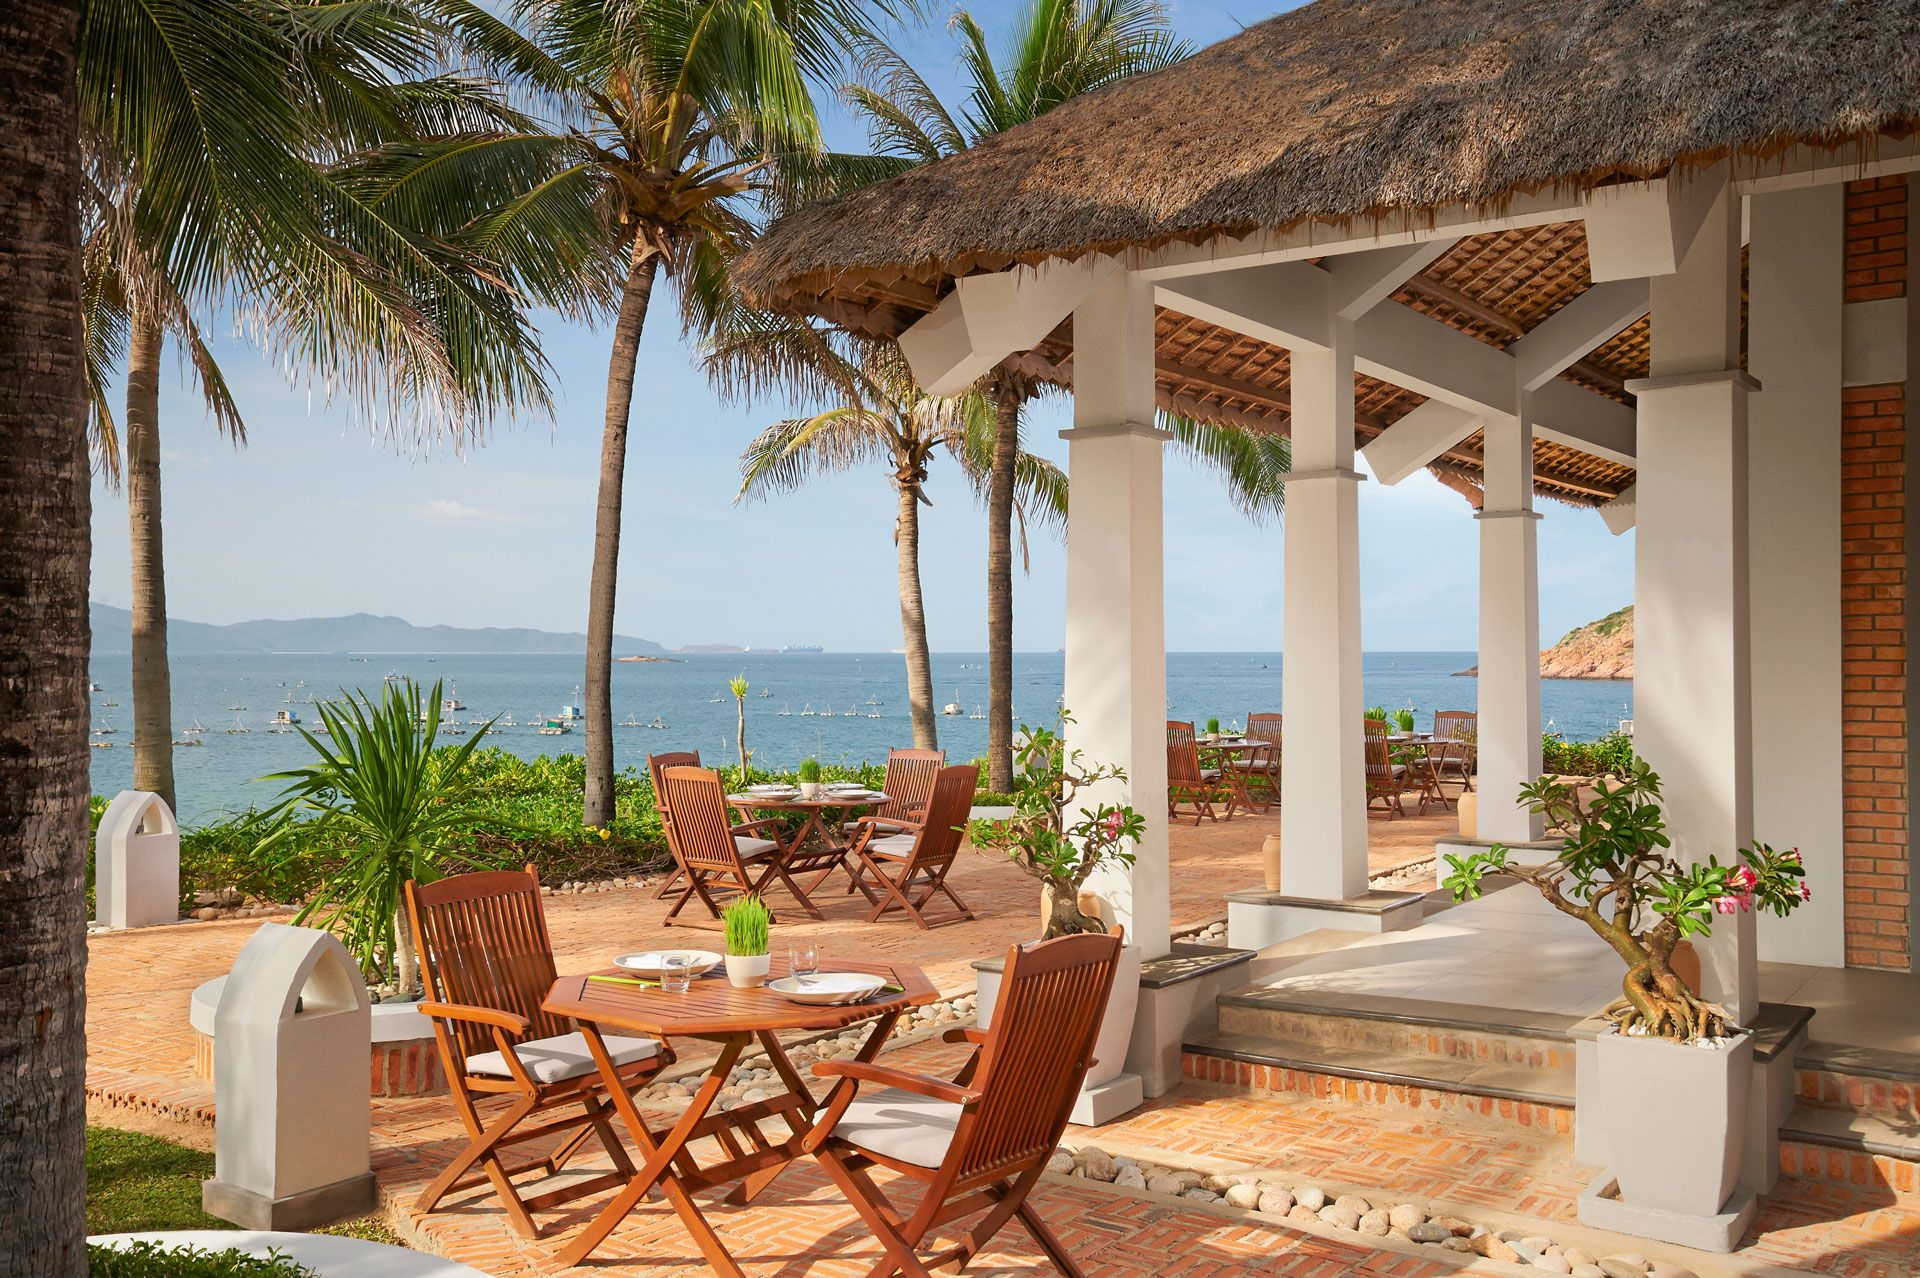 AVANI QUY NHON RESORT & SPA Vietnam LANDSCAPE ARCHITECTURE DESIGNED BY TOPO DESIGN STUDIO